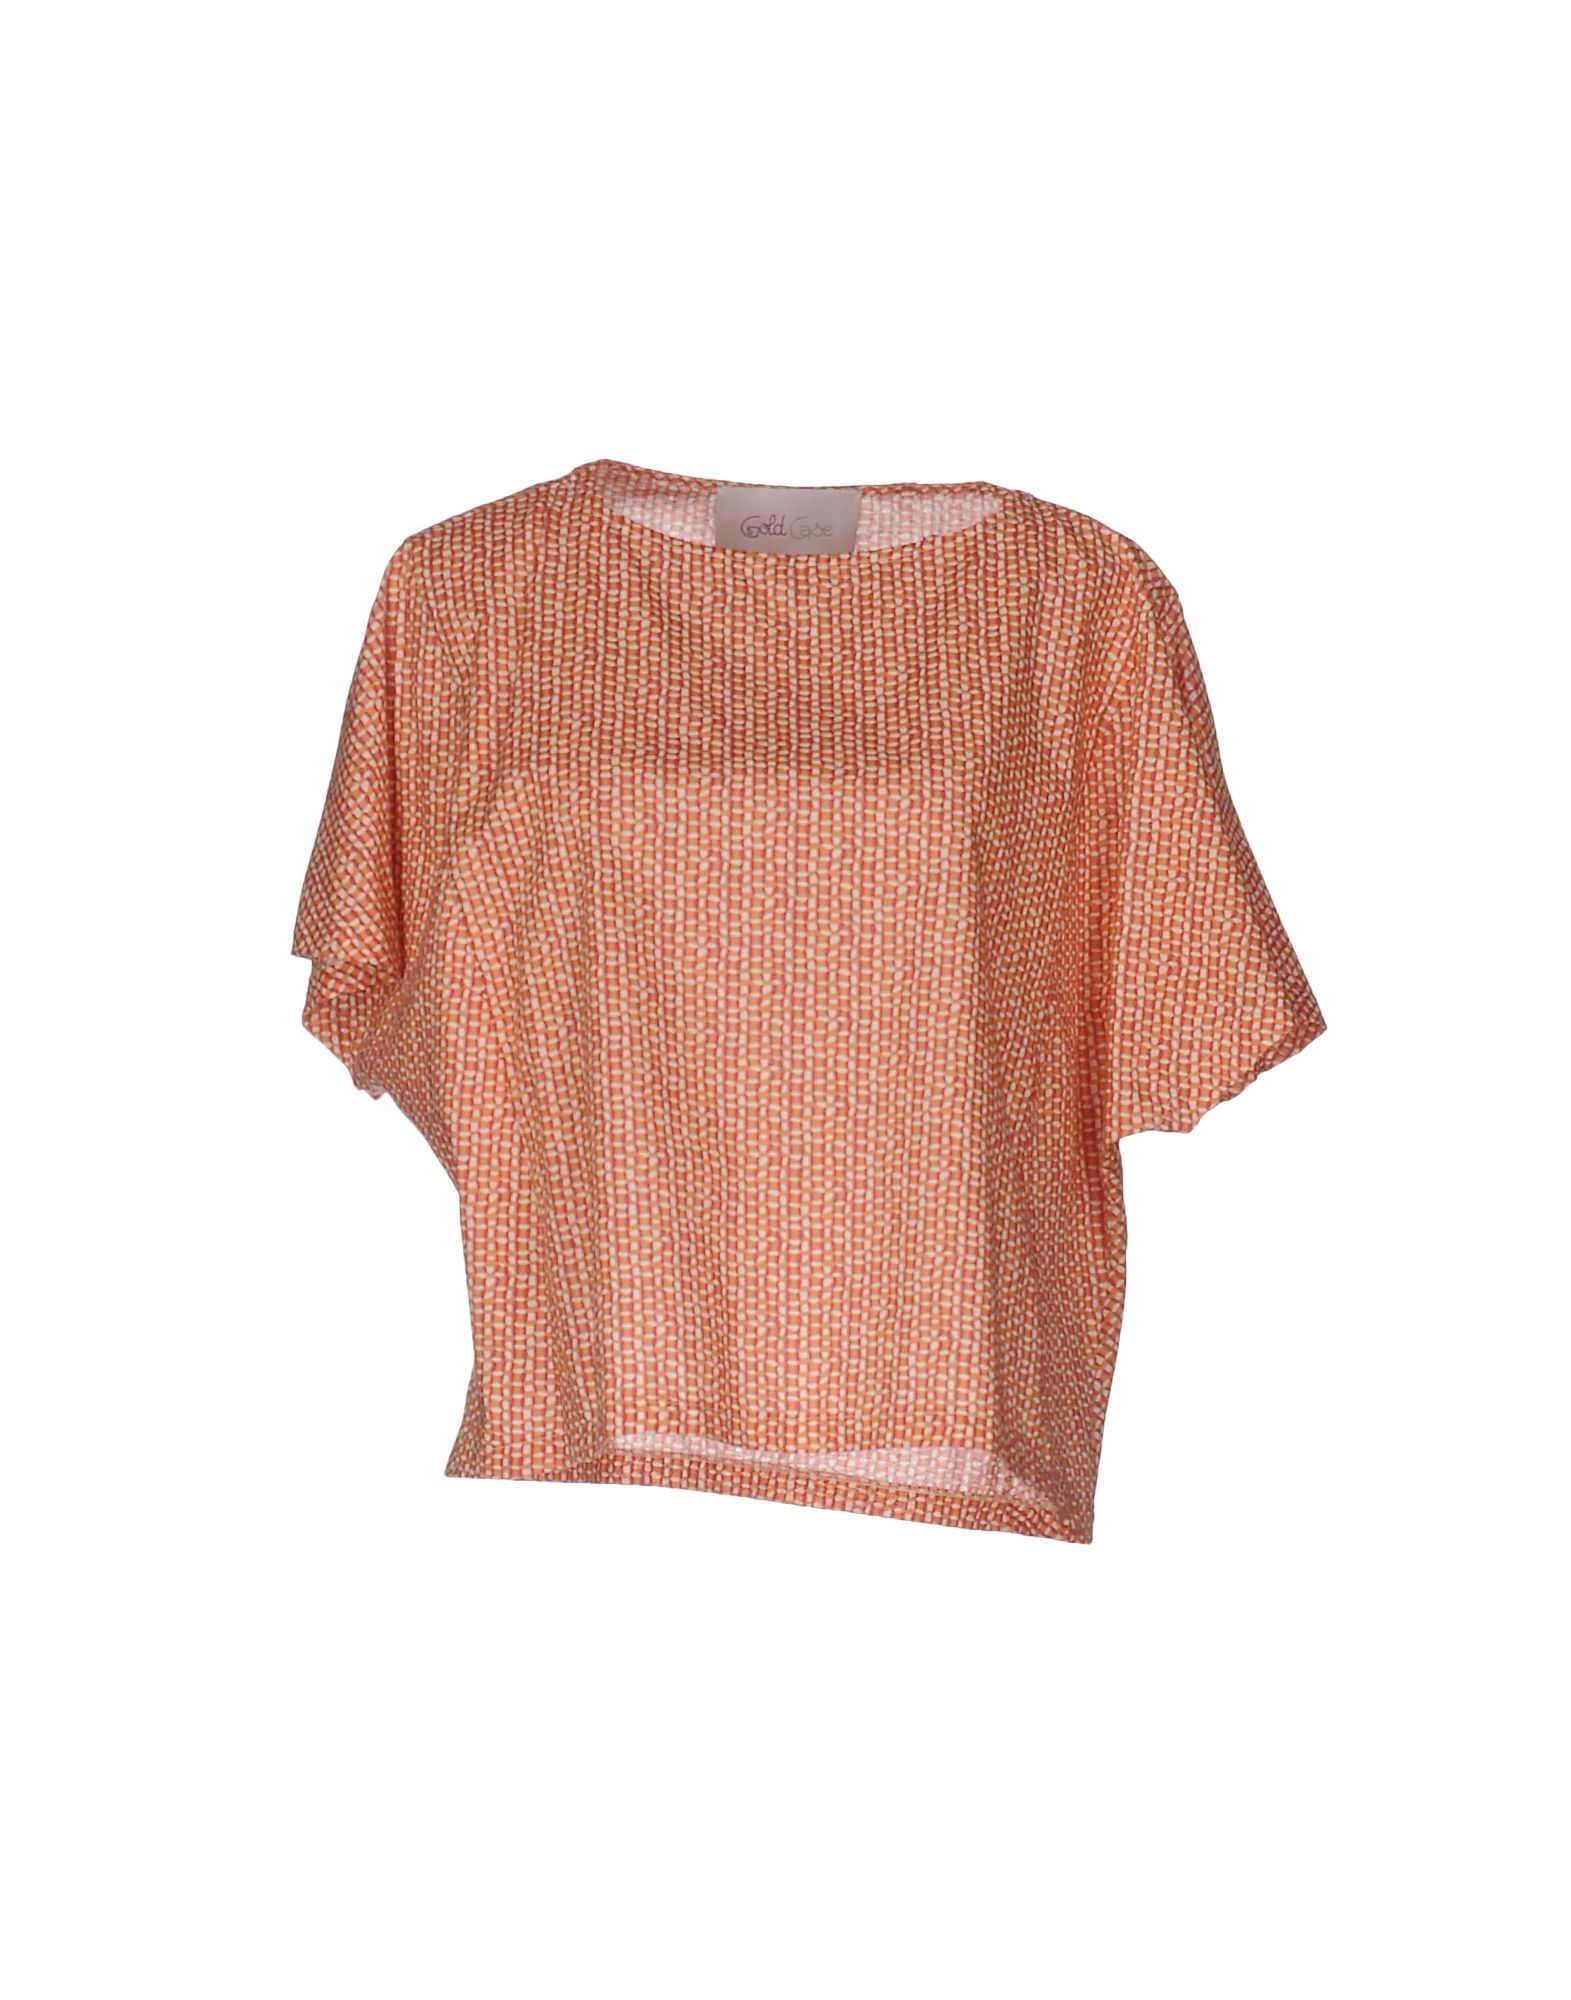 GOLD CASE Блузка gold case pубашка